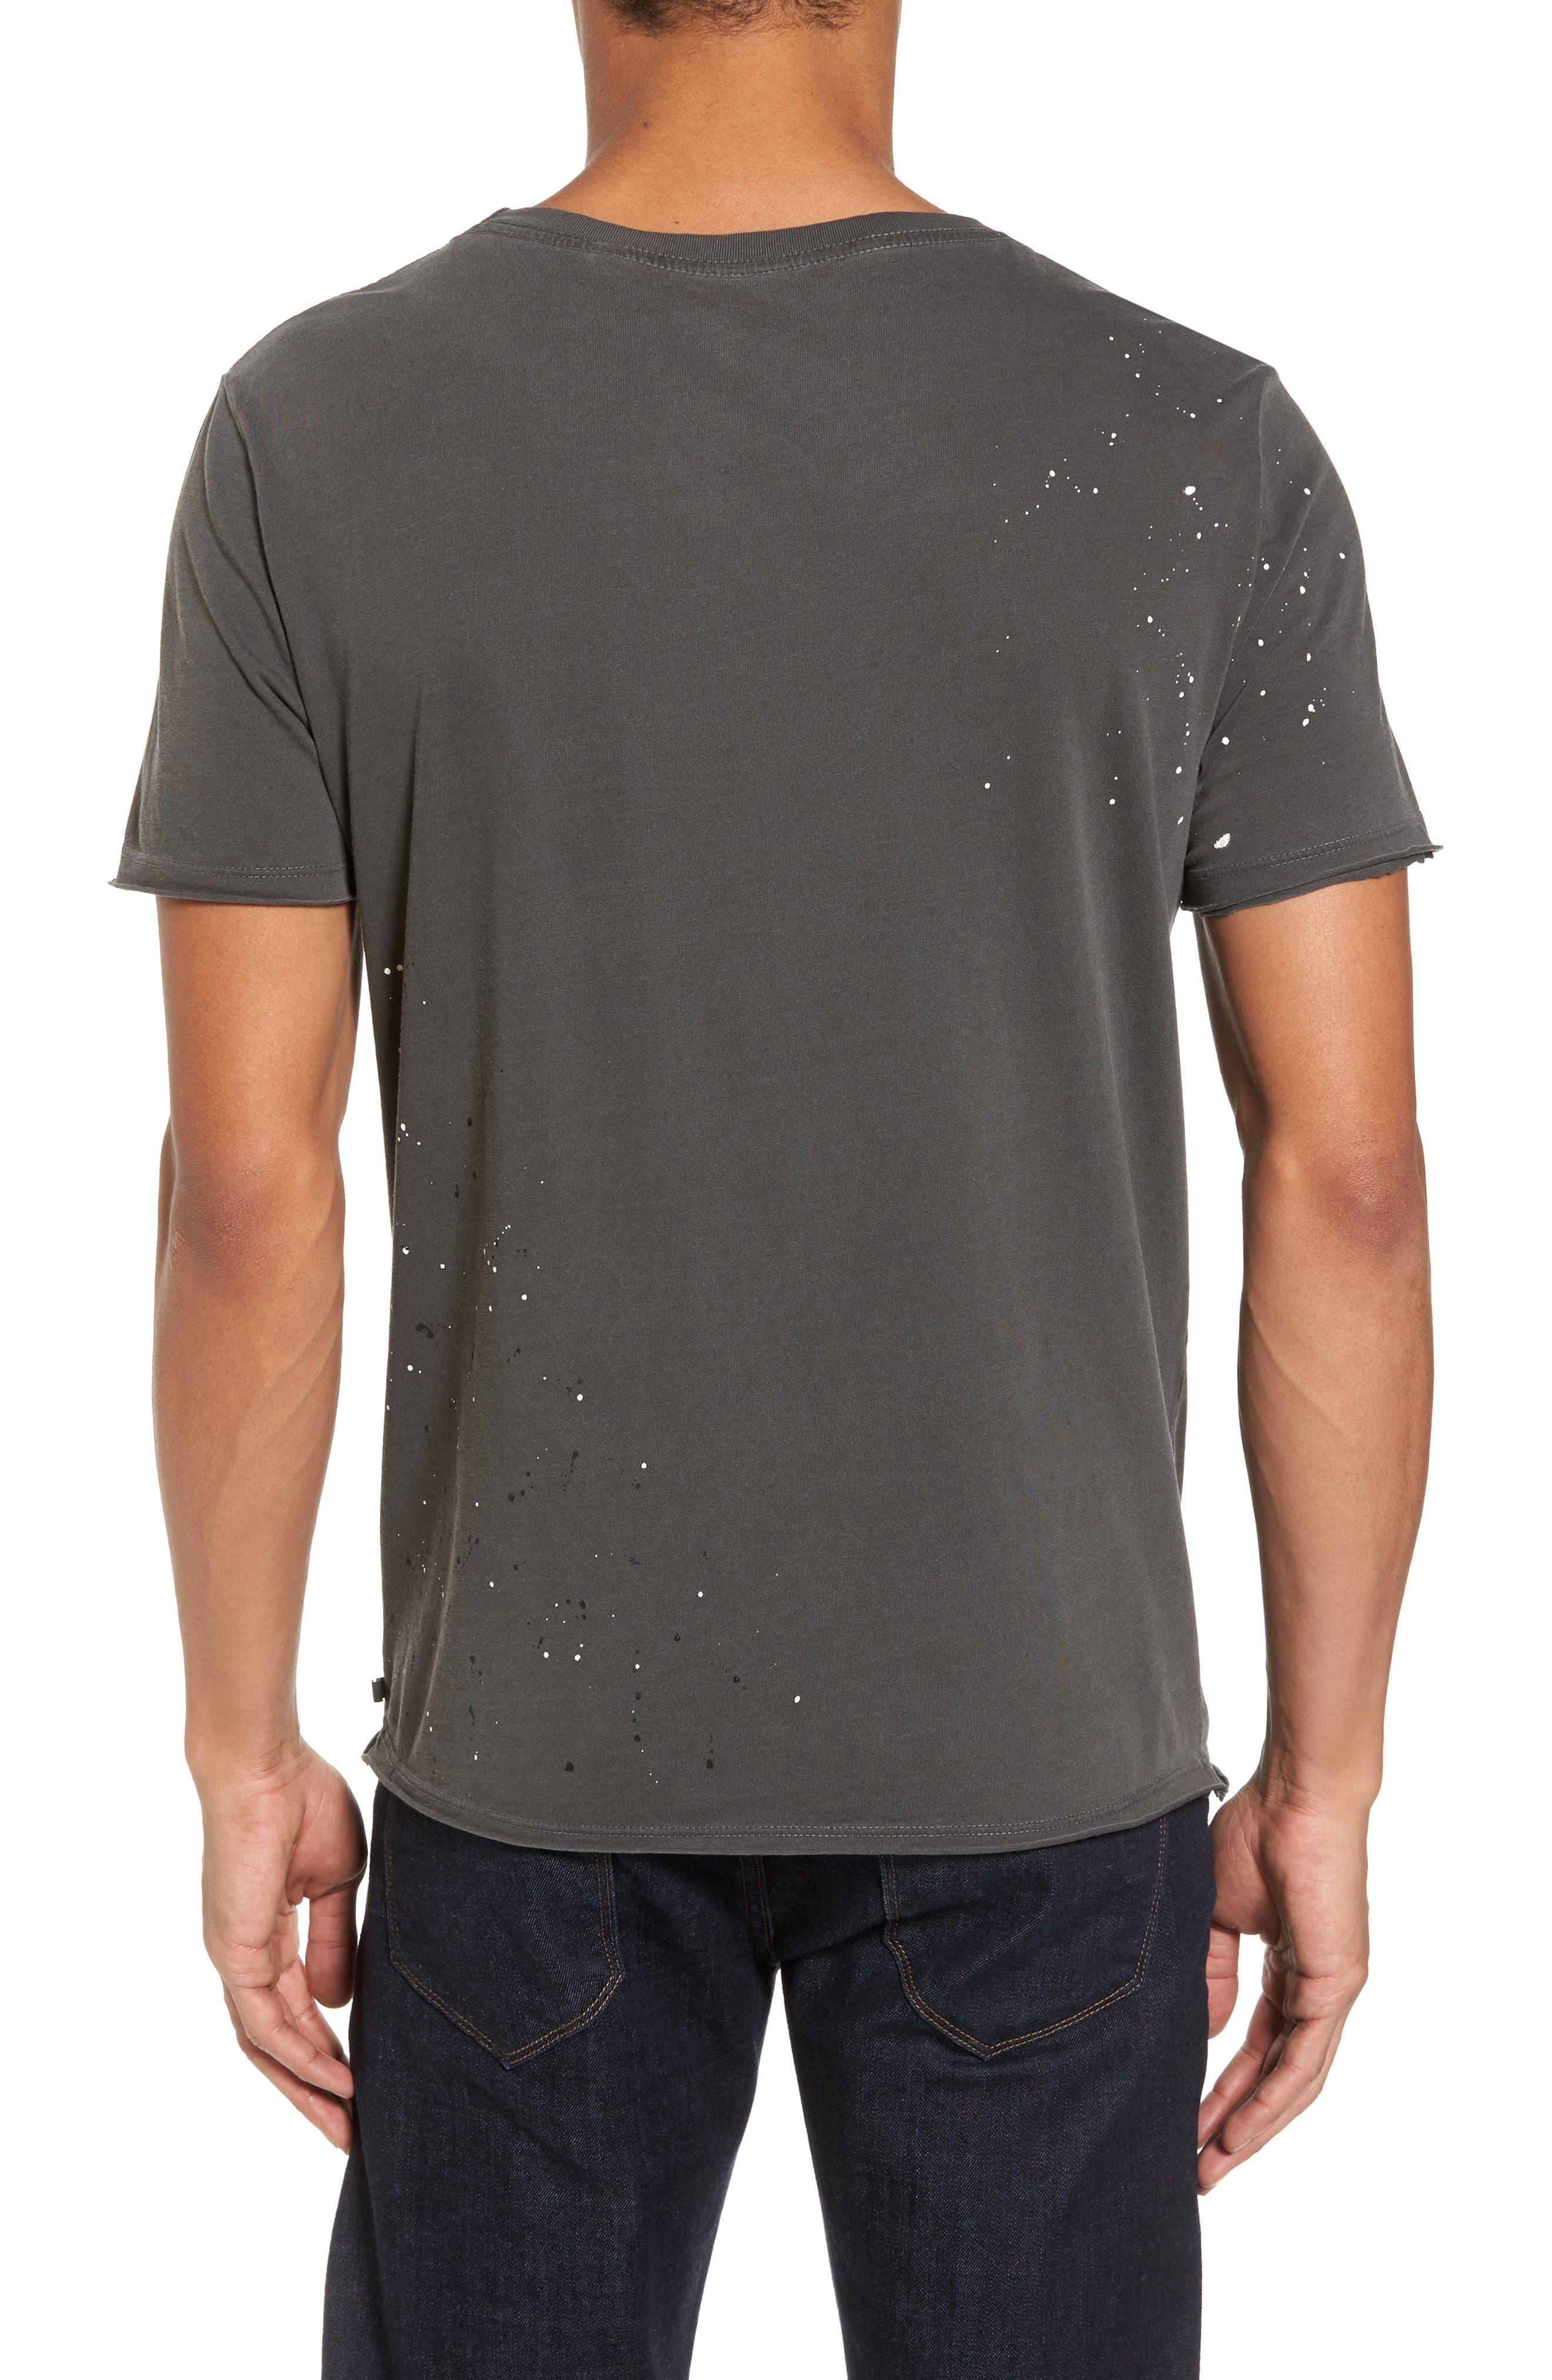 Anders Slim Fit Pocket T-Shirt,                             Alternate thumbnail 2, color,                             Multi Splatter Pigment Black